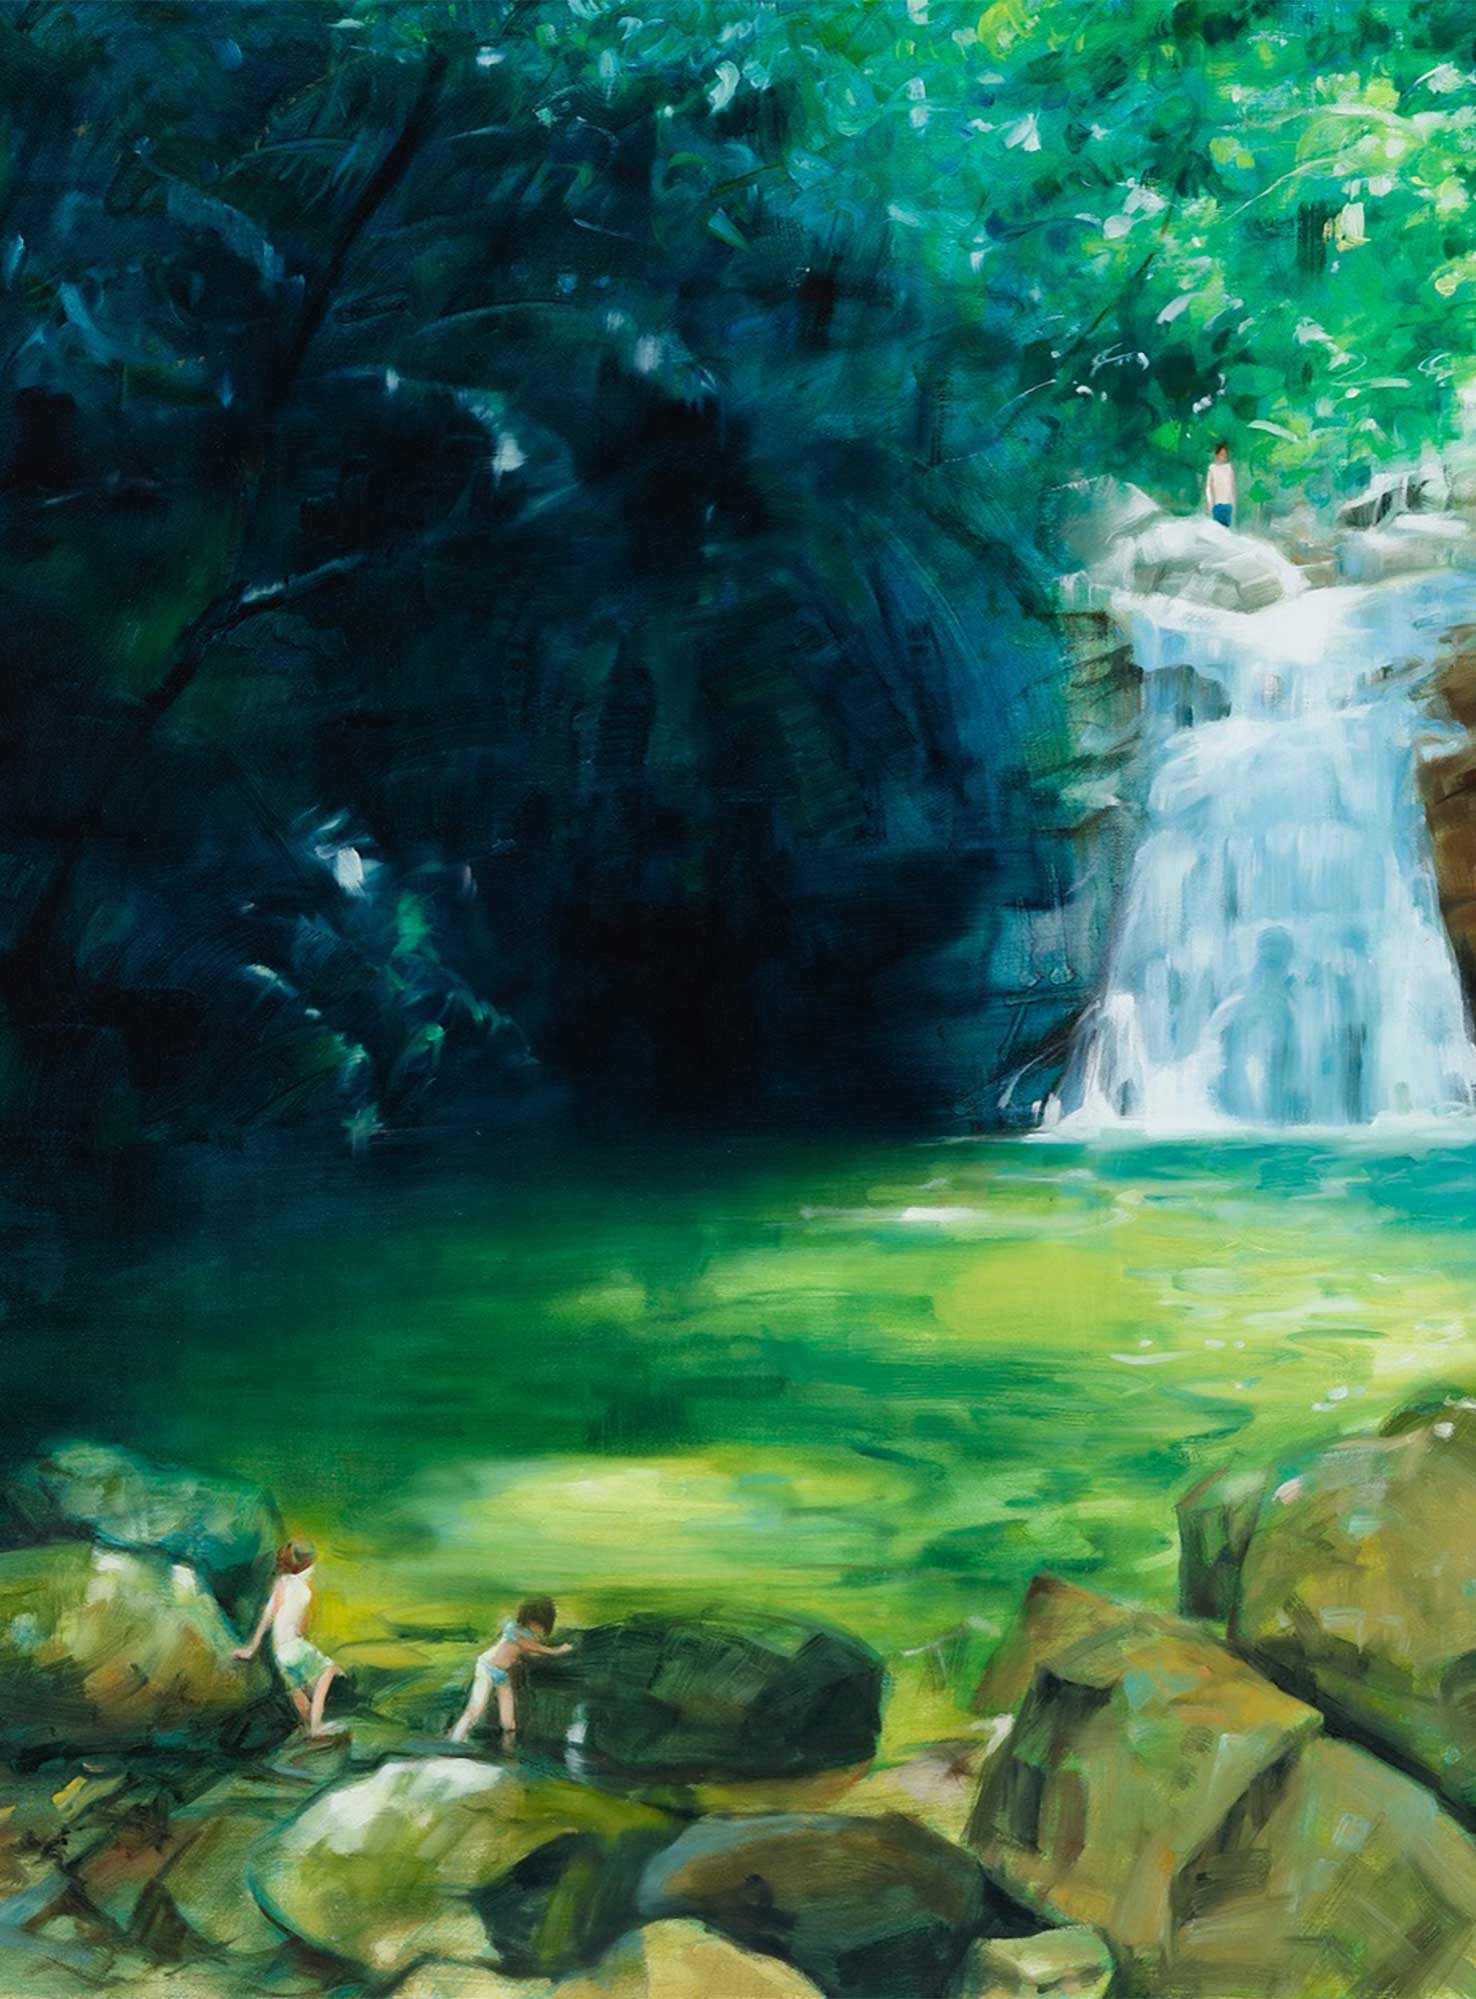 Waterfall - Green (2015) by Mana Konishi